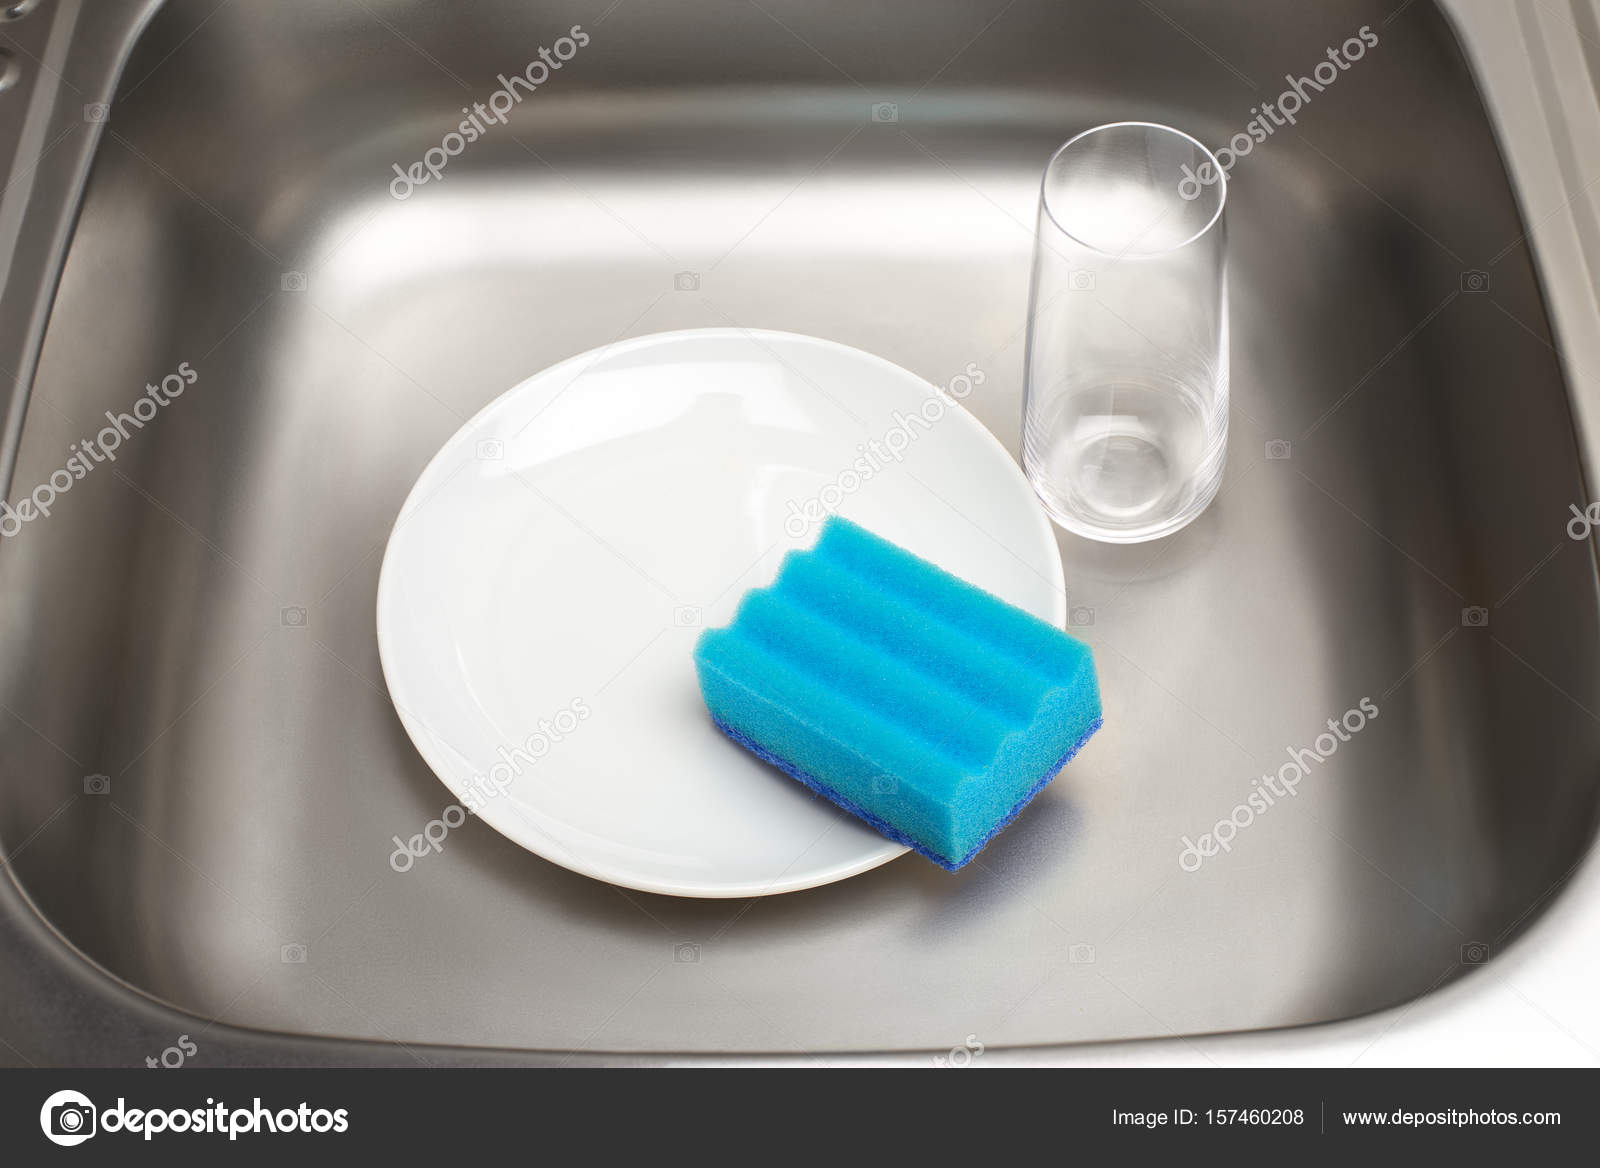 blue kitchen sink redo my 厨房水槽与板 蓝色清洁海绵玻璃 图库照片 c intelwond 157460208